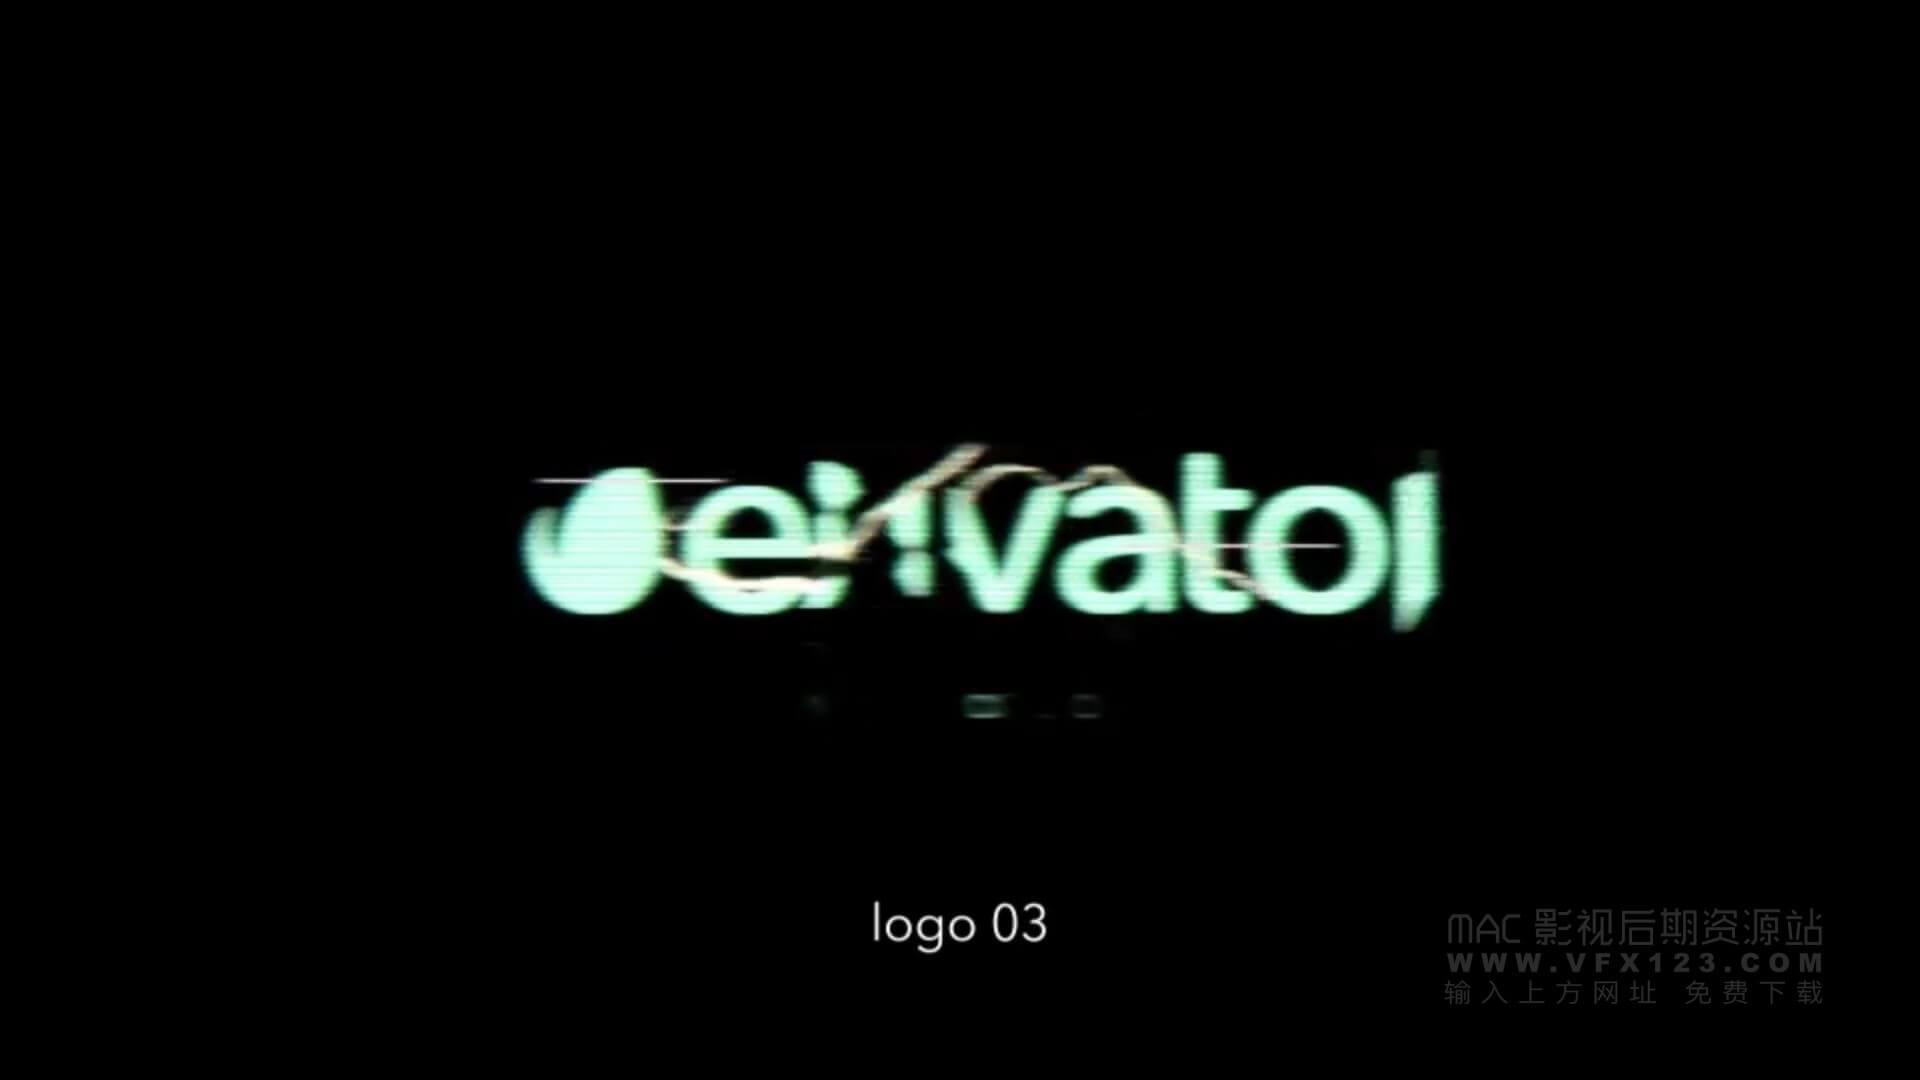 Fcpx主题模板 信号失真故障干扰LOGO展示 motion模板 Glitch Logos